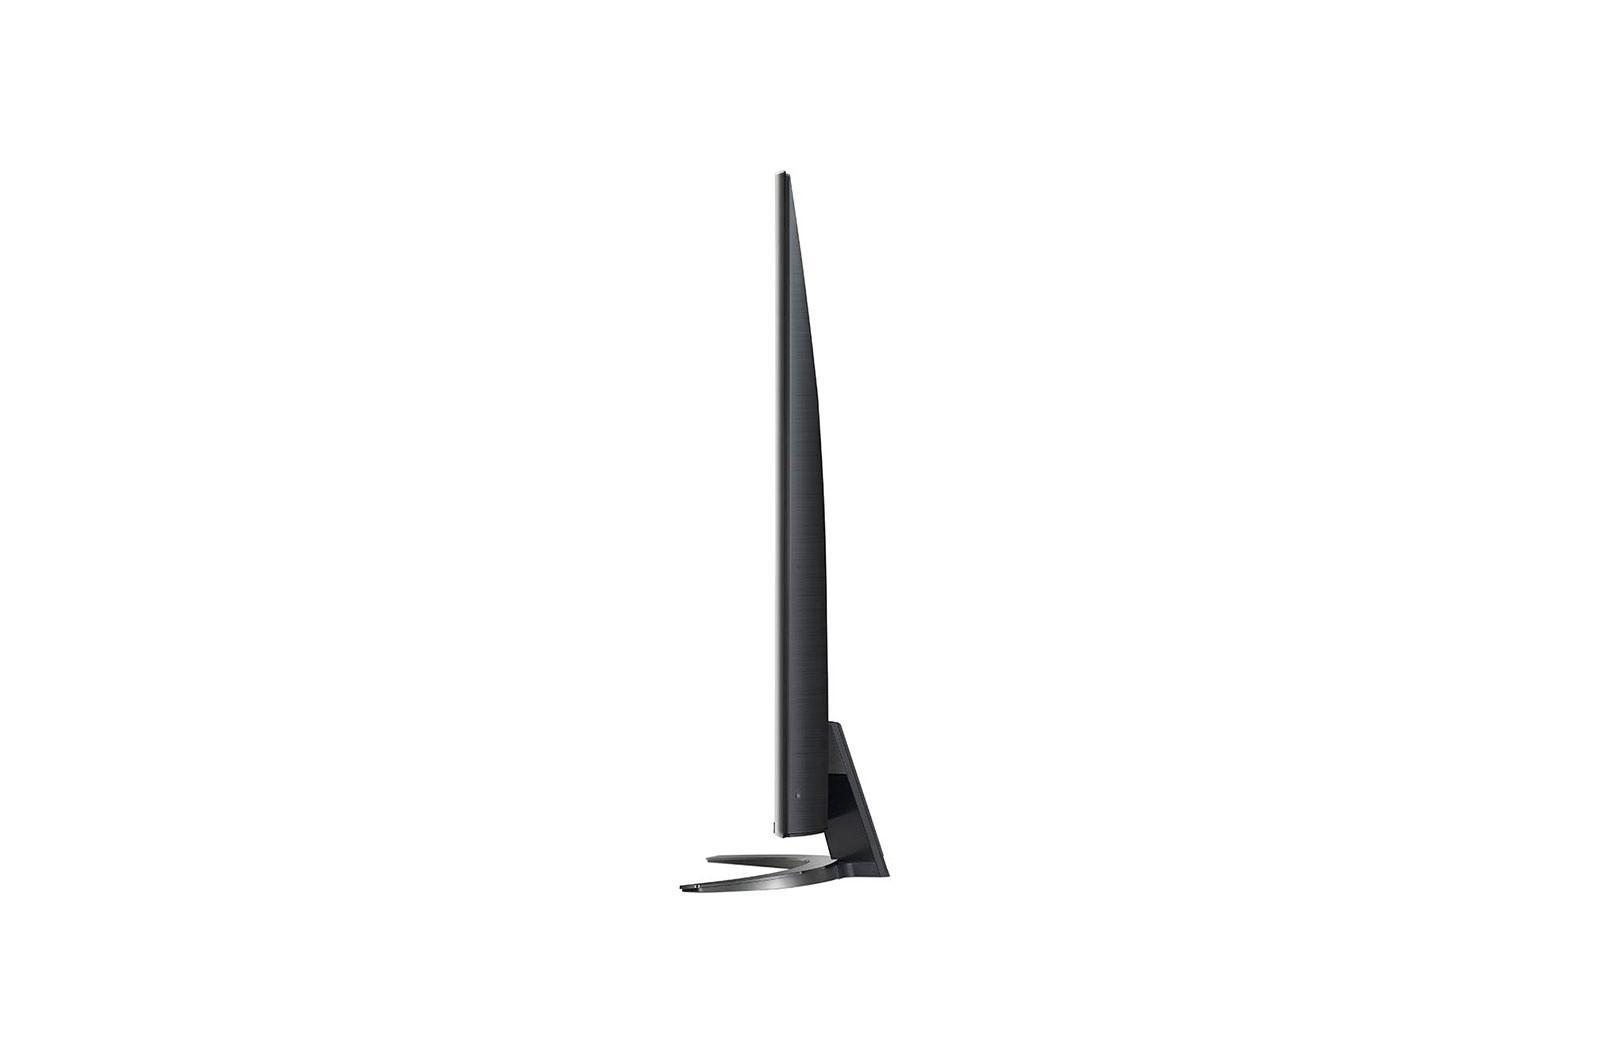 Smart Tivi 4K LG 55 inch 55SM8600PTA Nanocell HDR